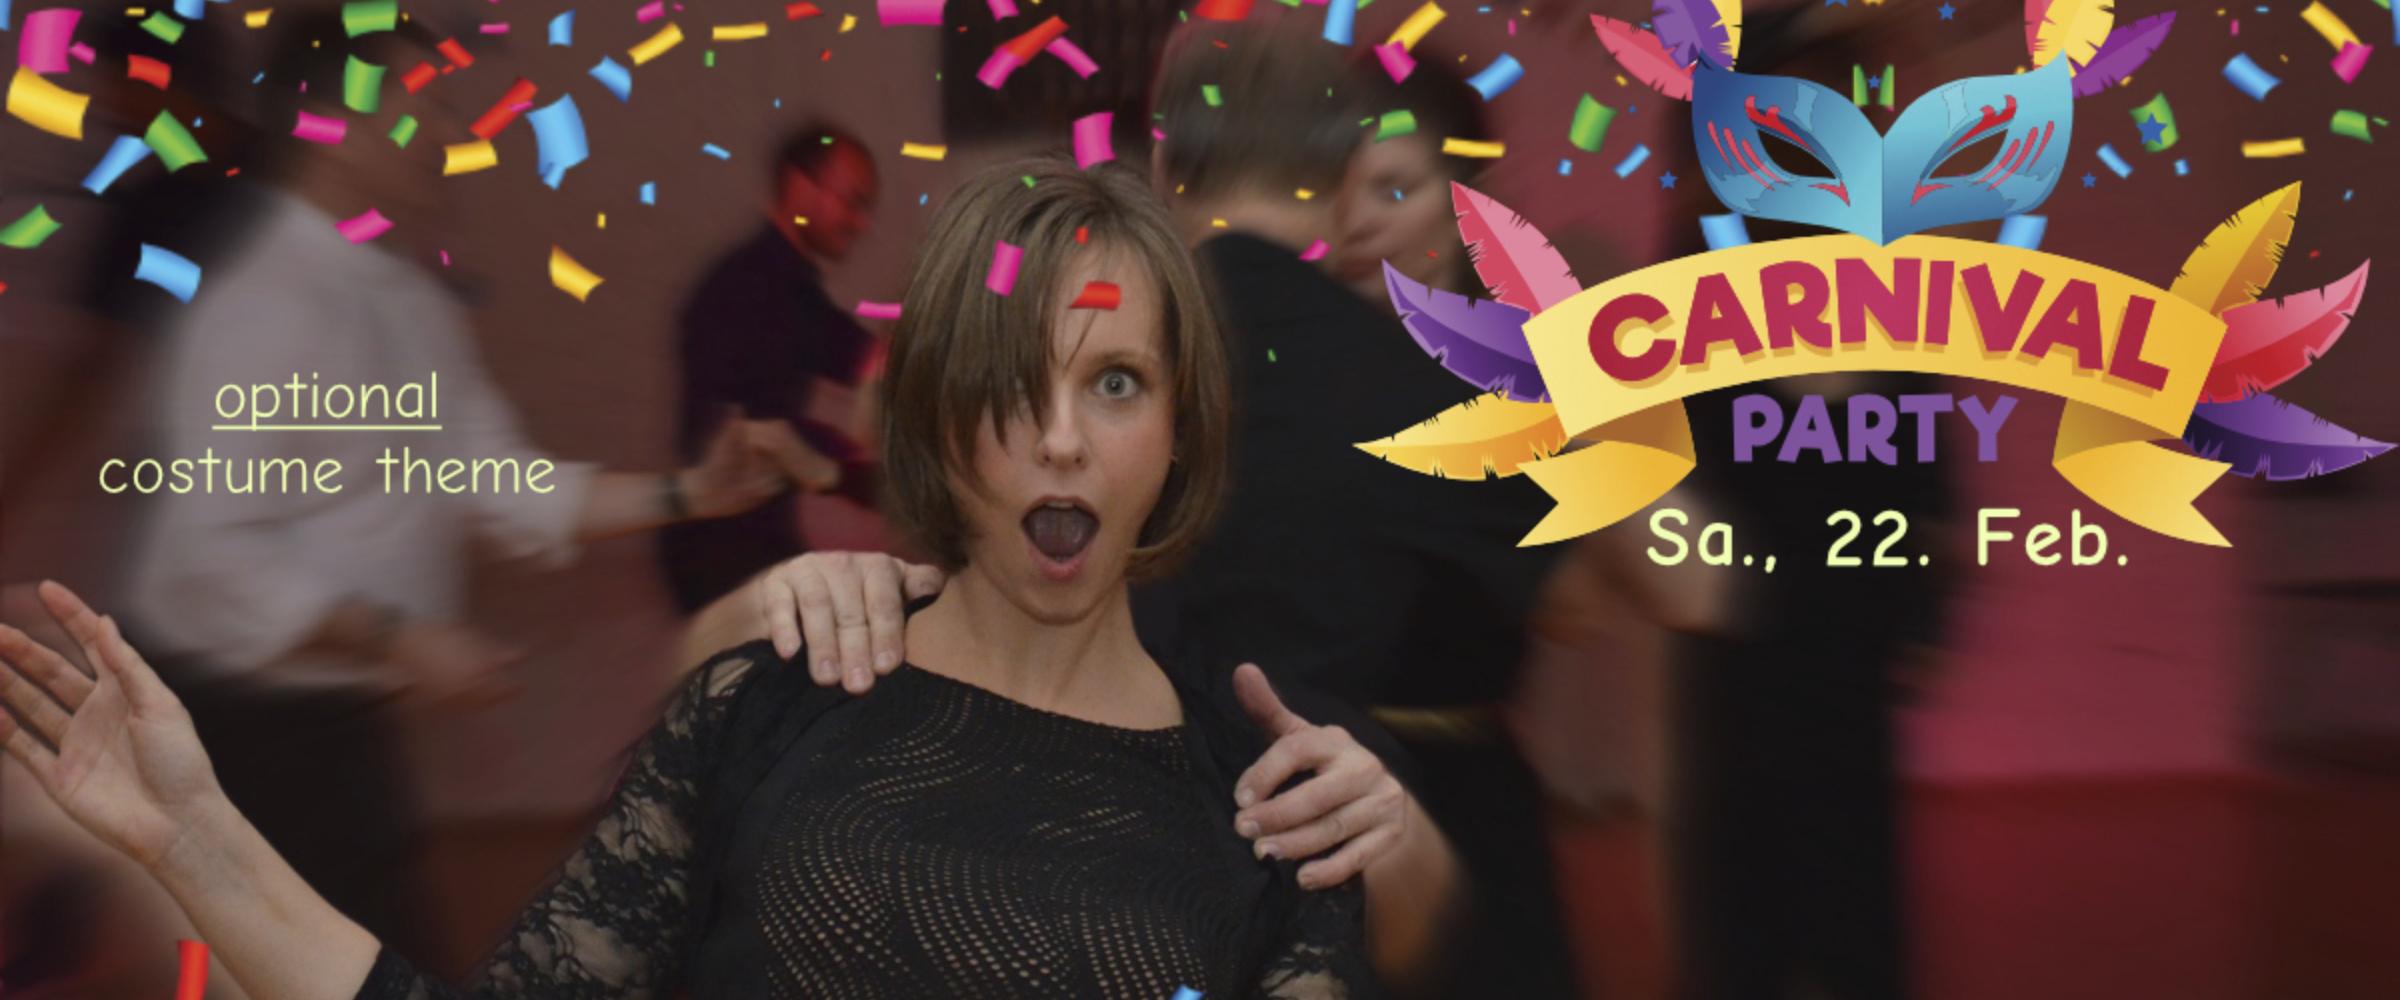 Modern Jive Karneval-Party: 22. Februar ab 21:00 Uhr mit Intro-Kurs